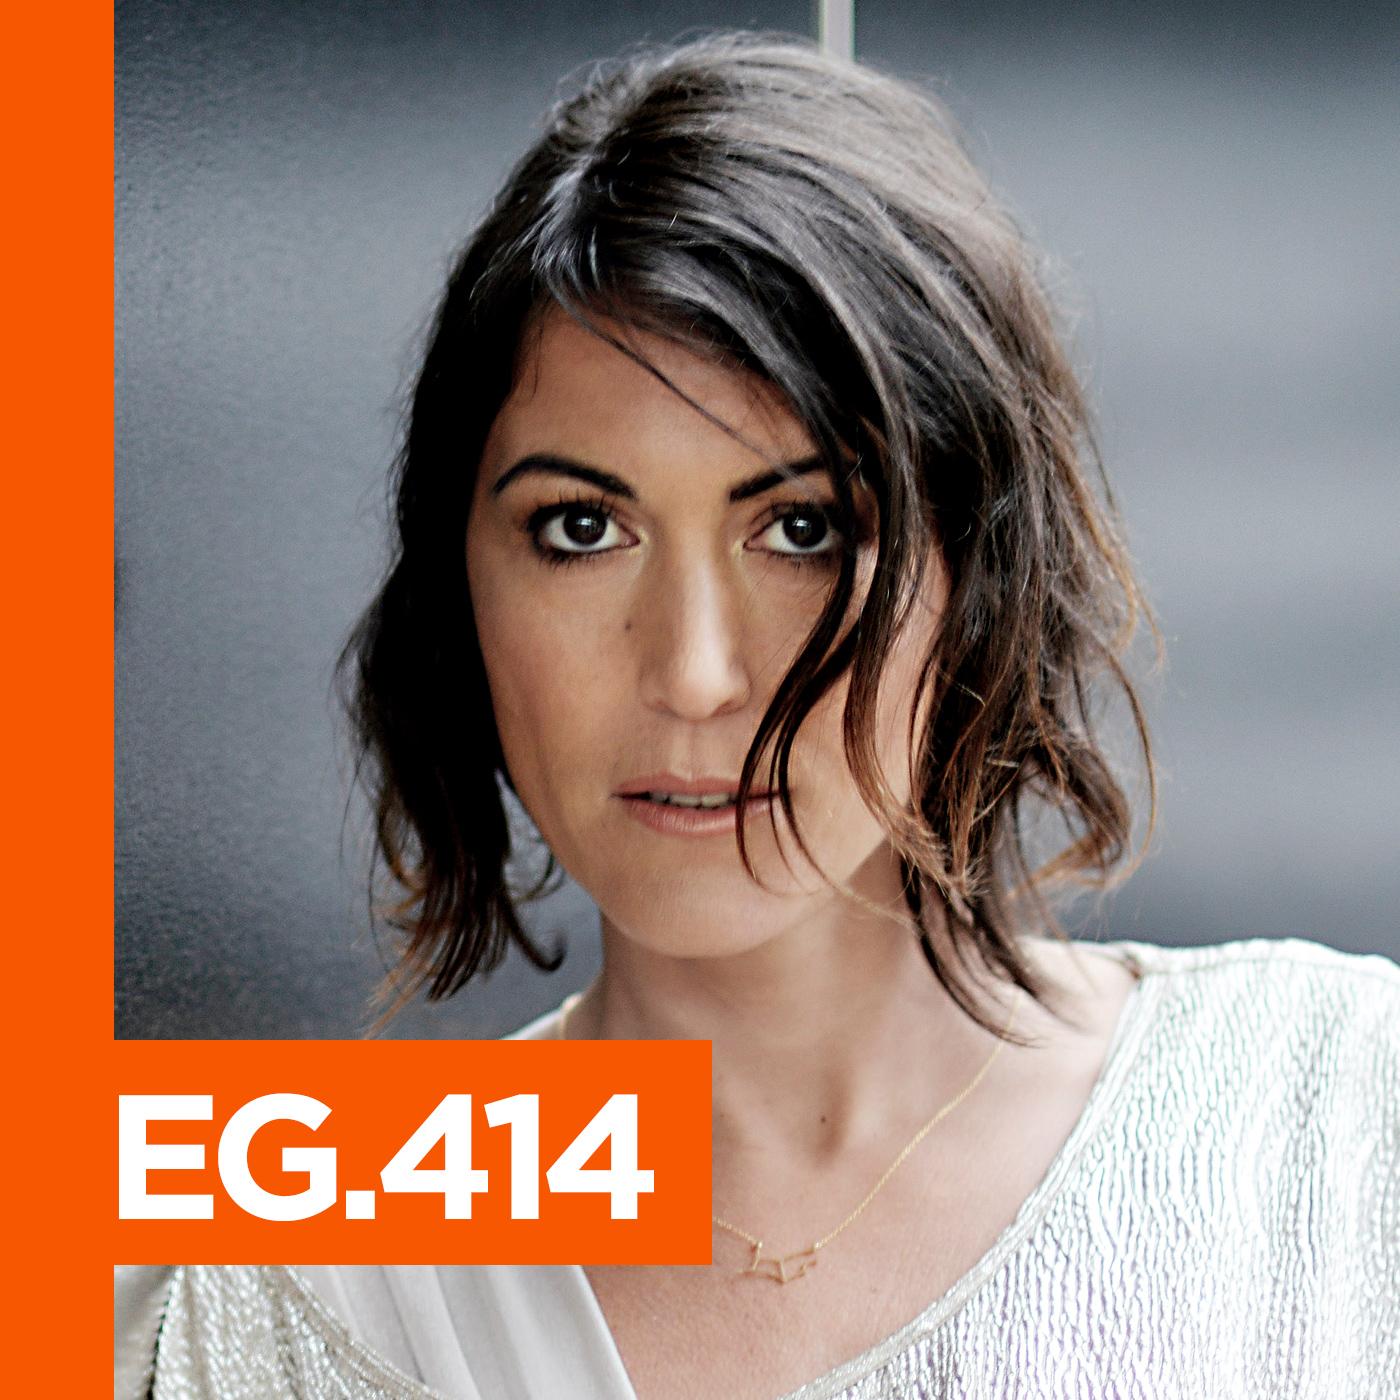 EG.414 Francesca Lombardo